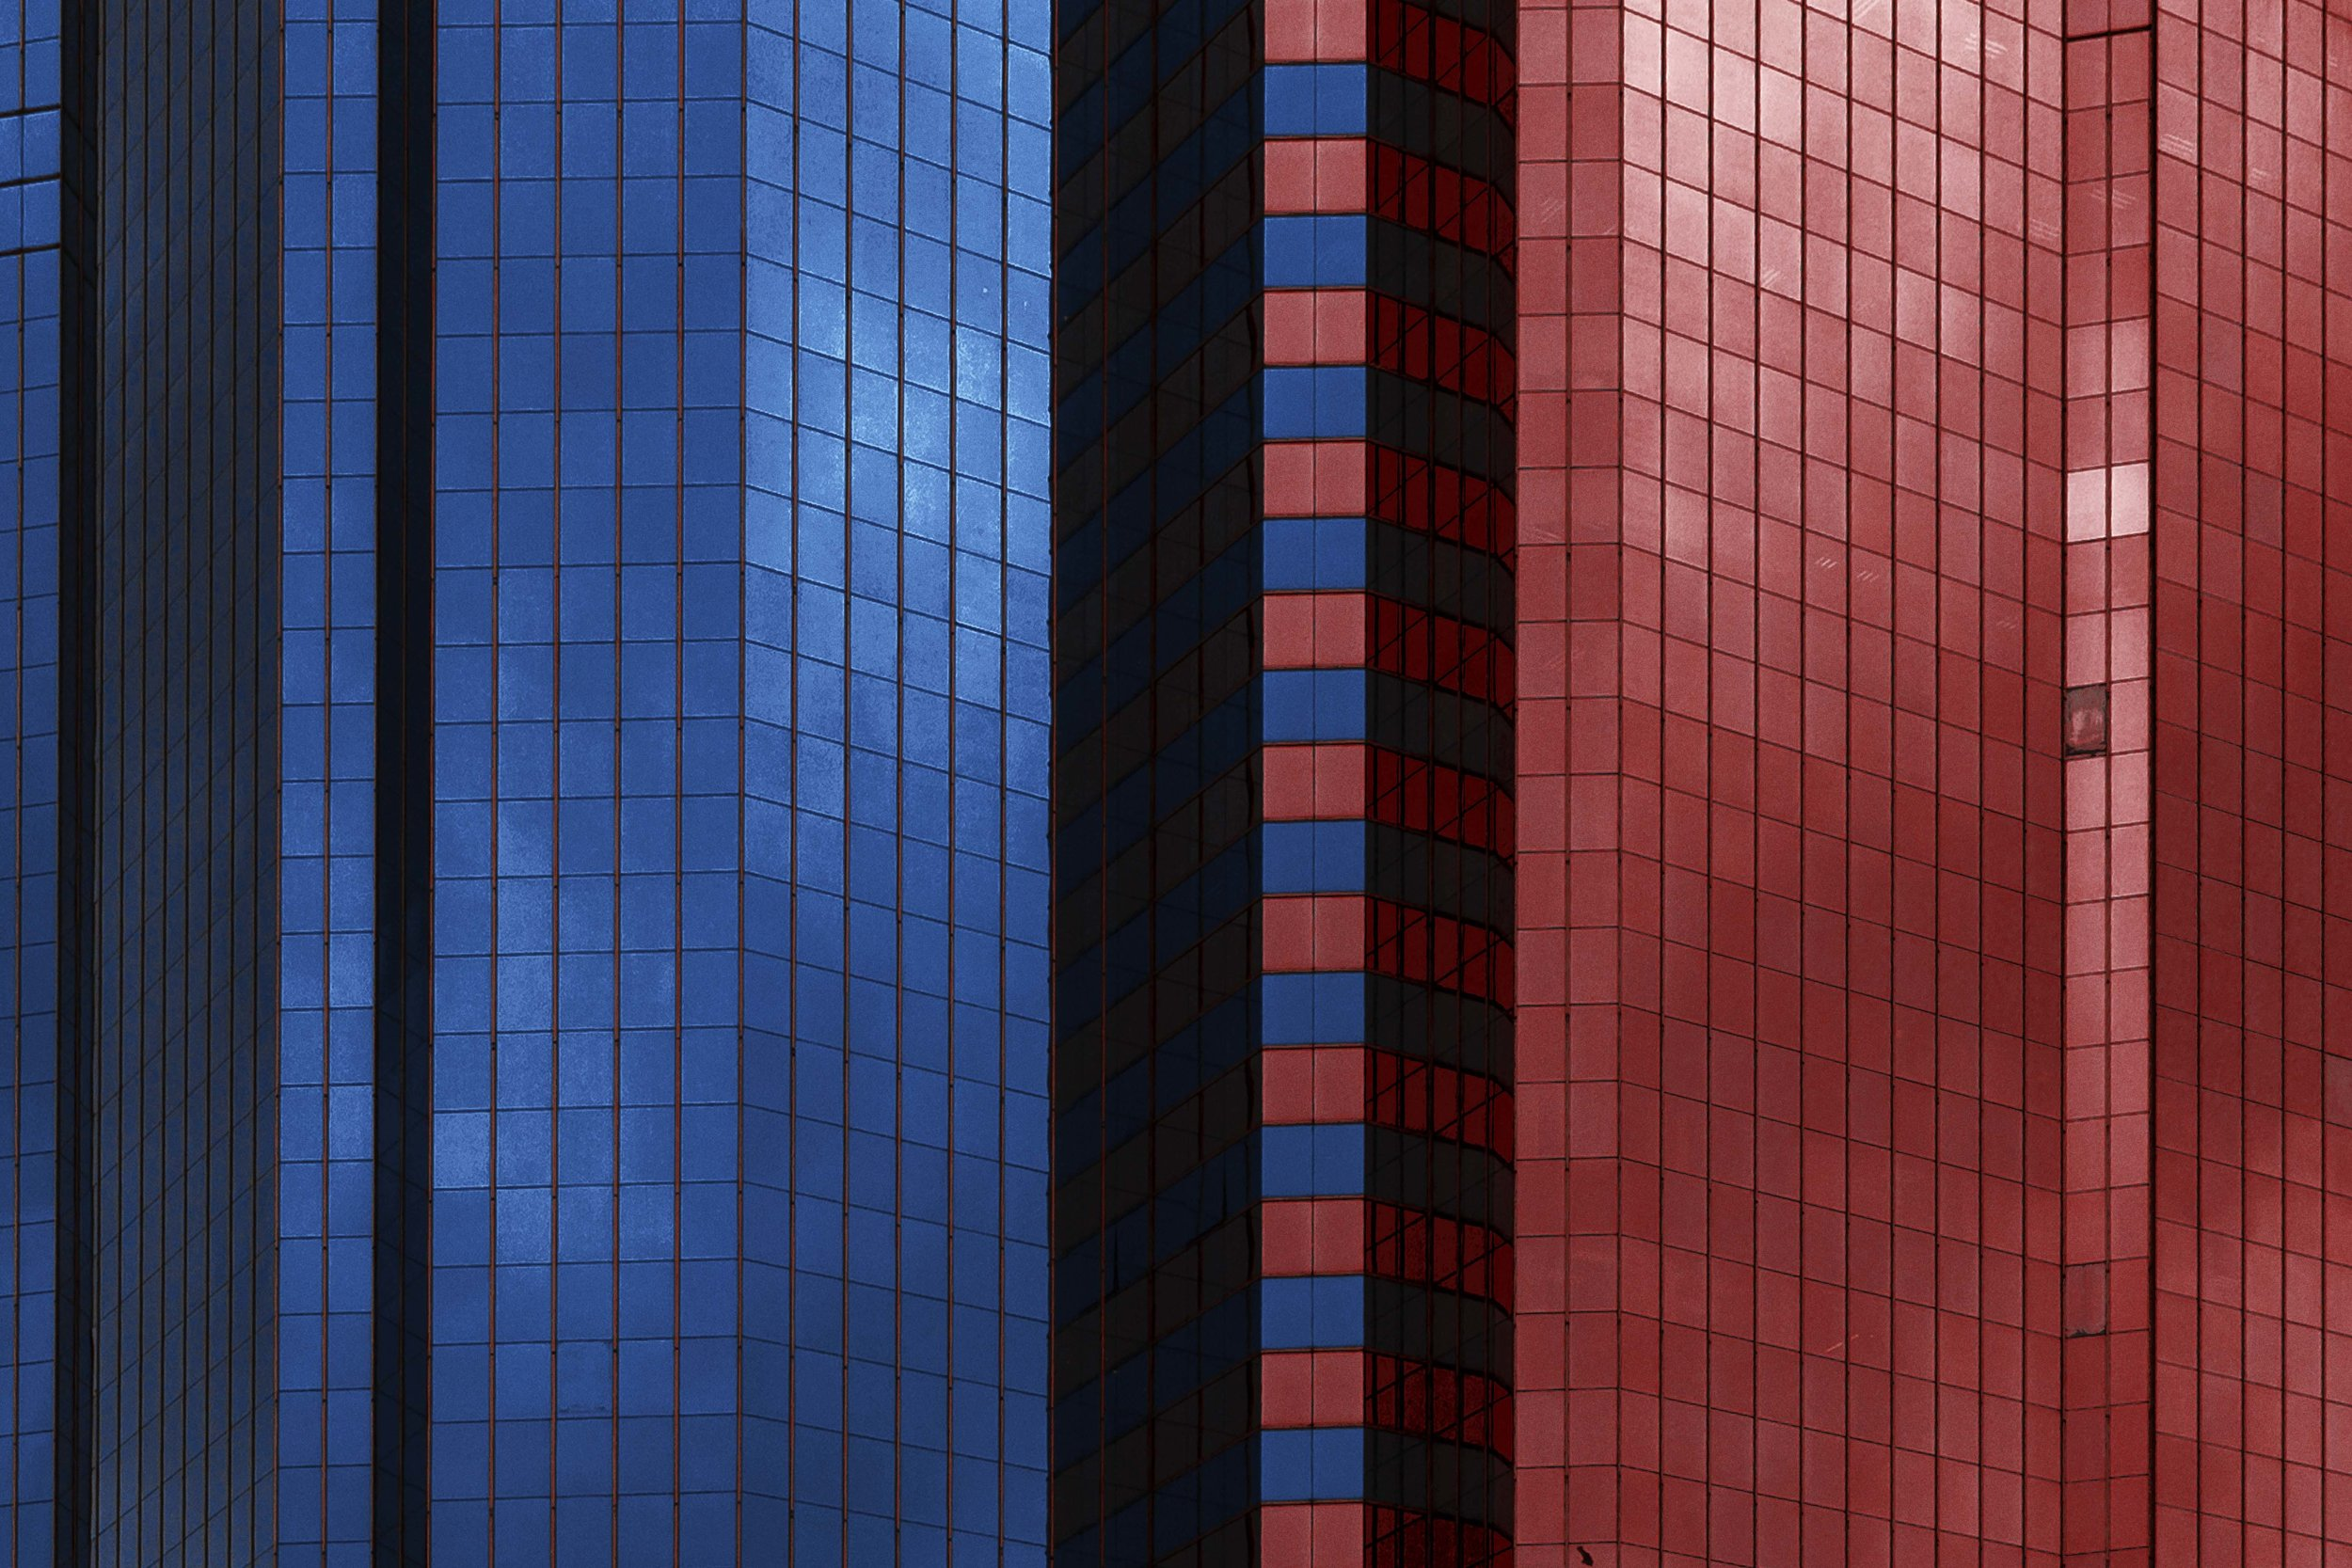 Divide, 2017  香港  24mm f/2.8 1/2000 sec ISO 125